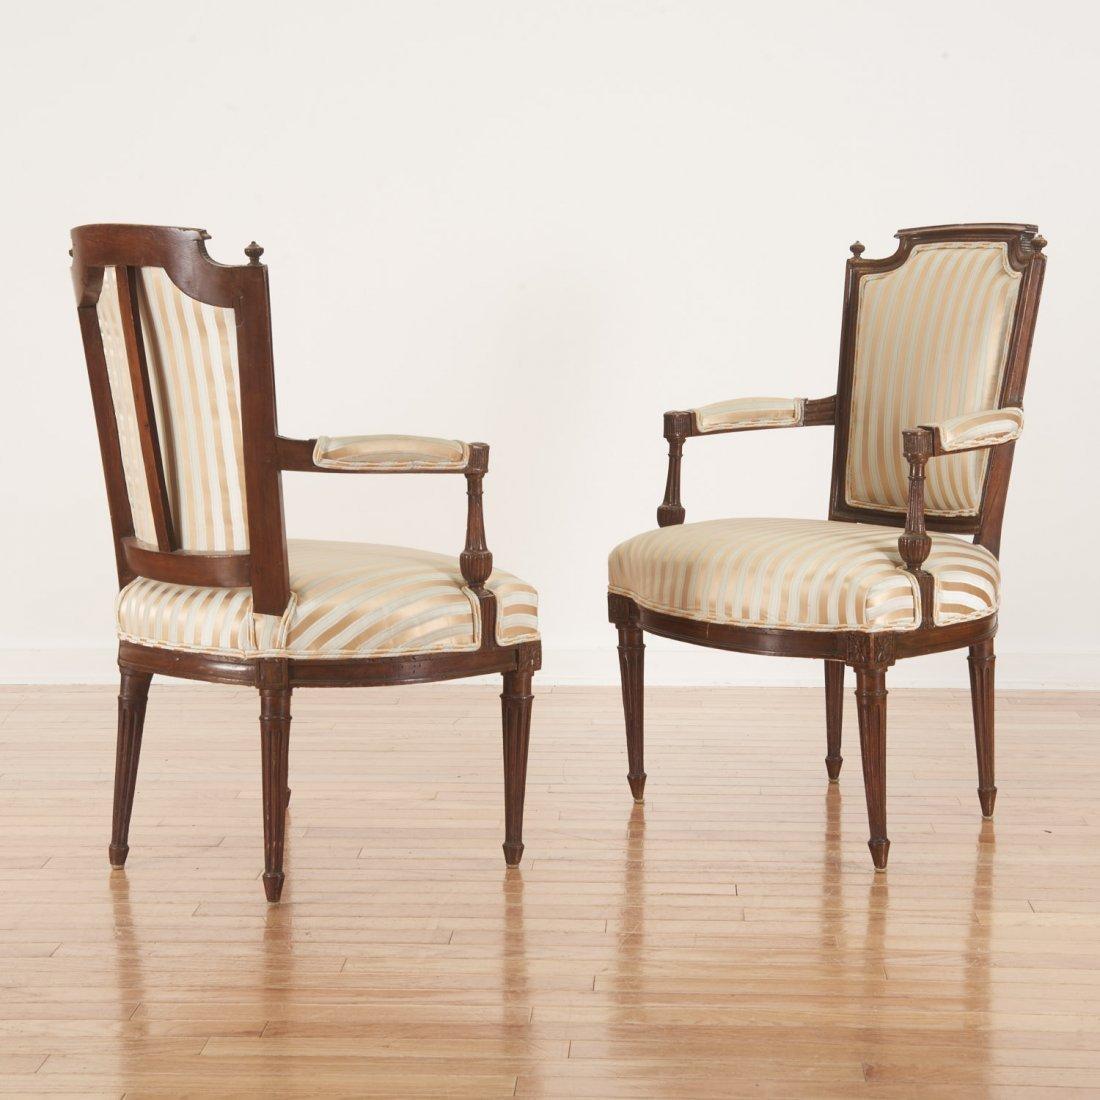 Pr Directoire silk upholstered mahogany fauteuils - 3